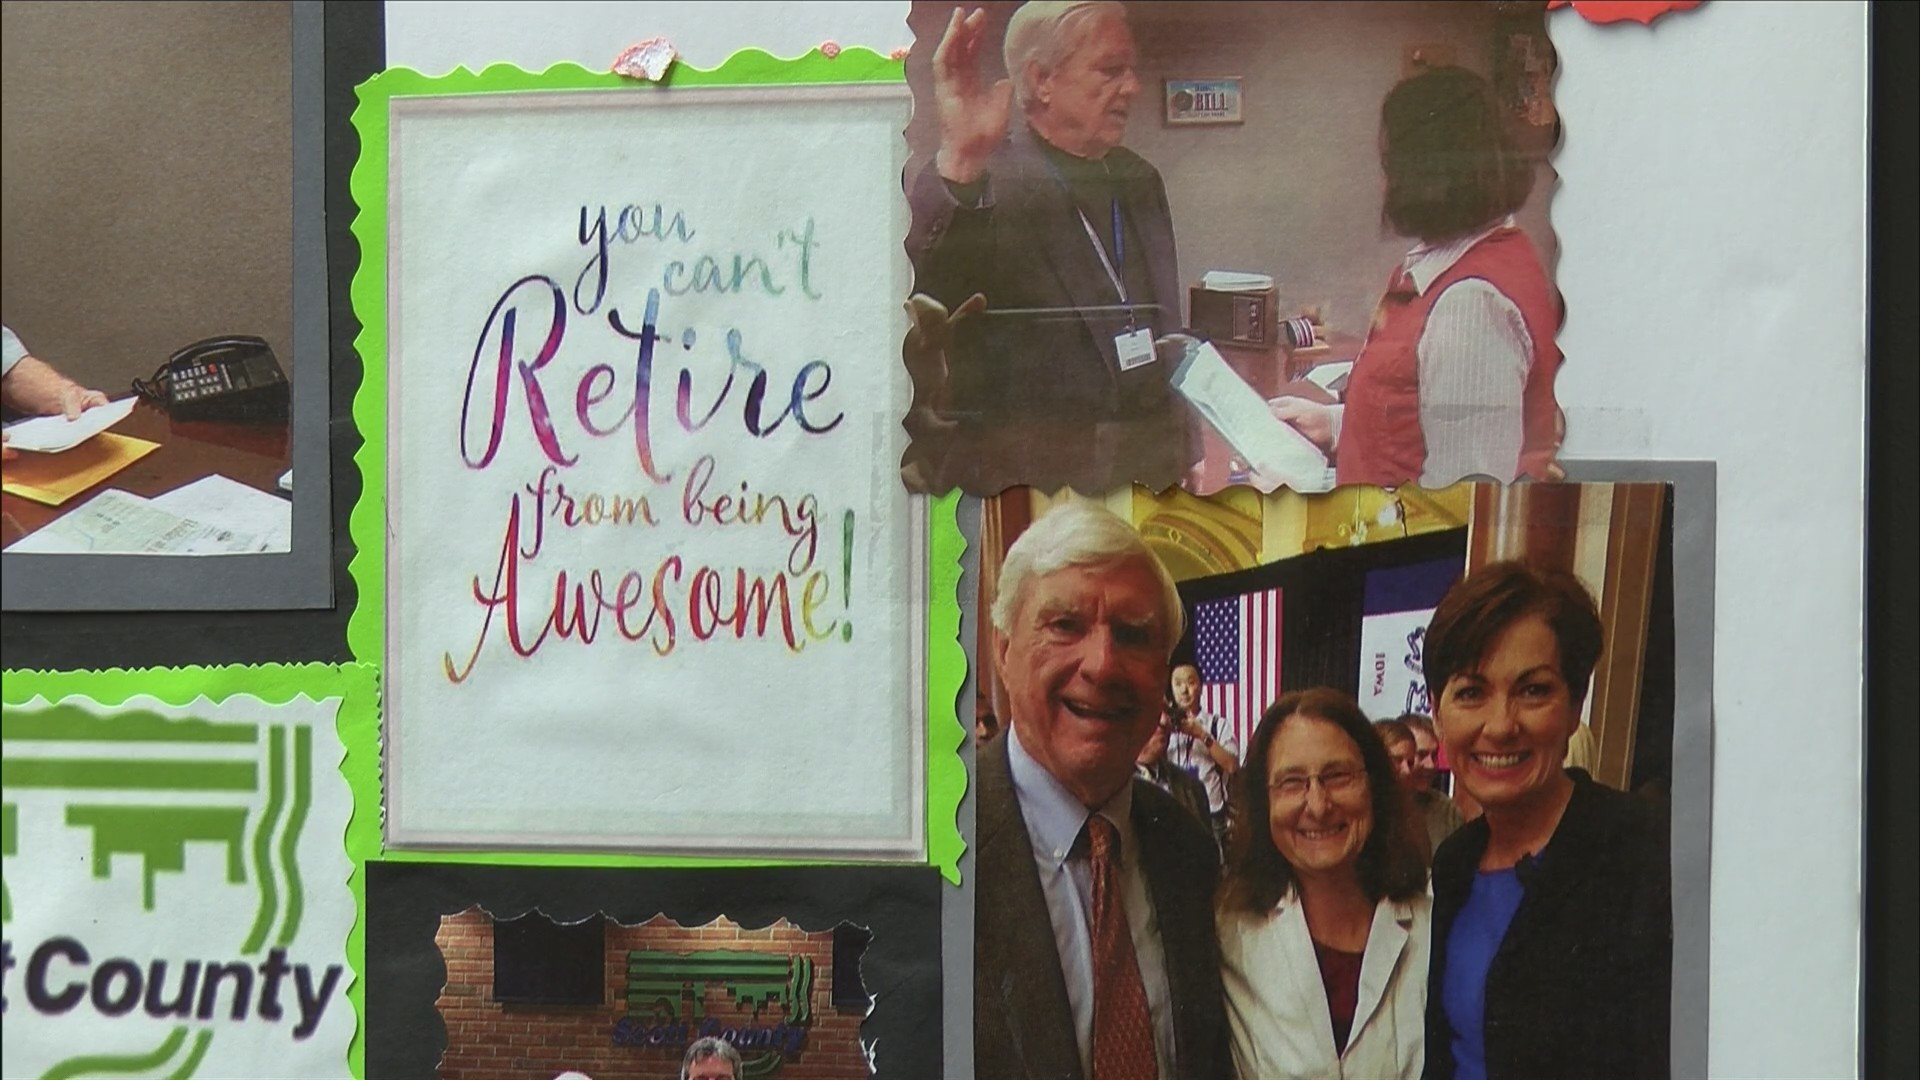 Bill Fennelly says goodbye to public service